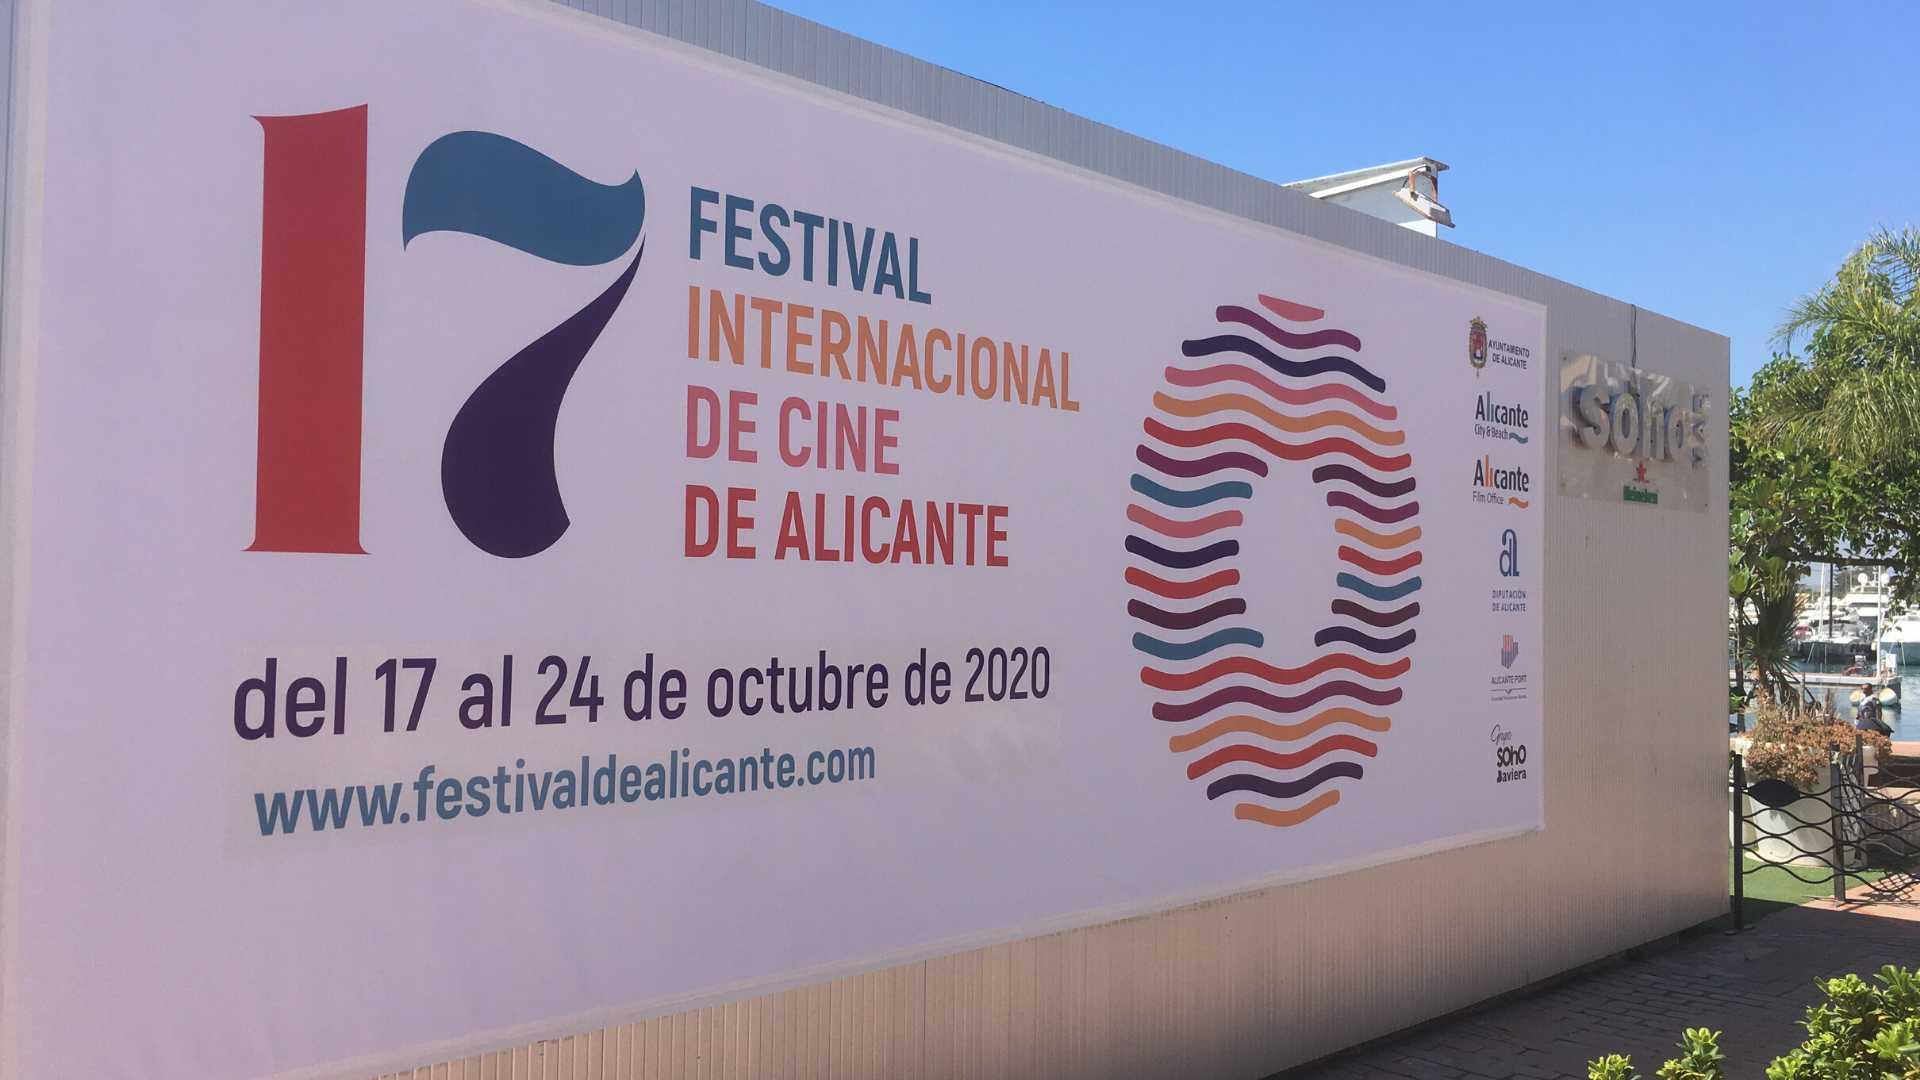 festival de cine d alicante 2021